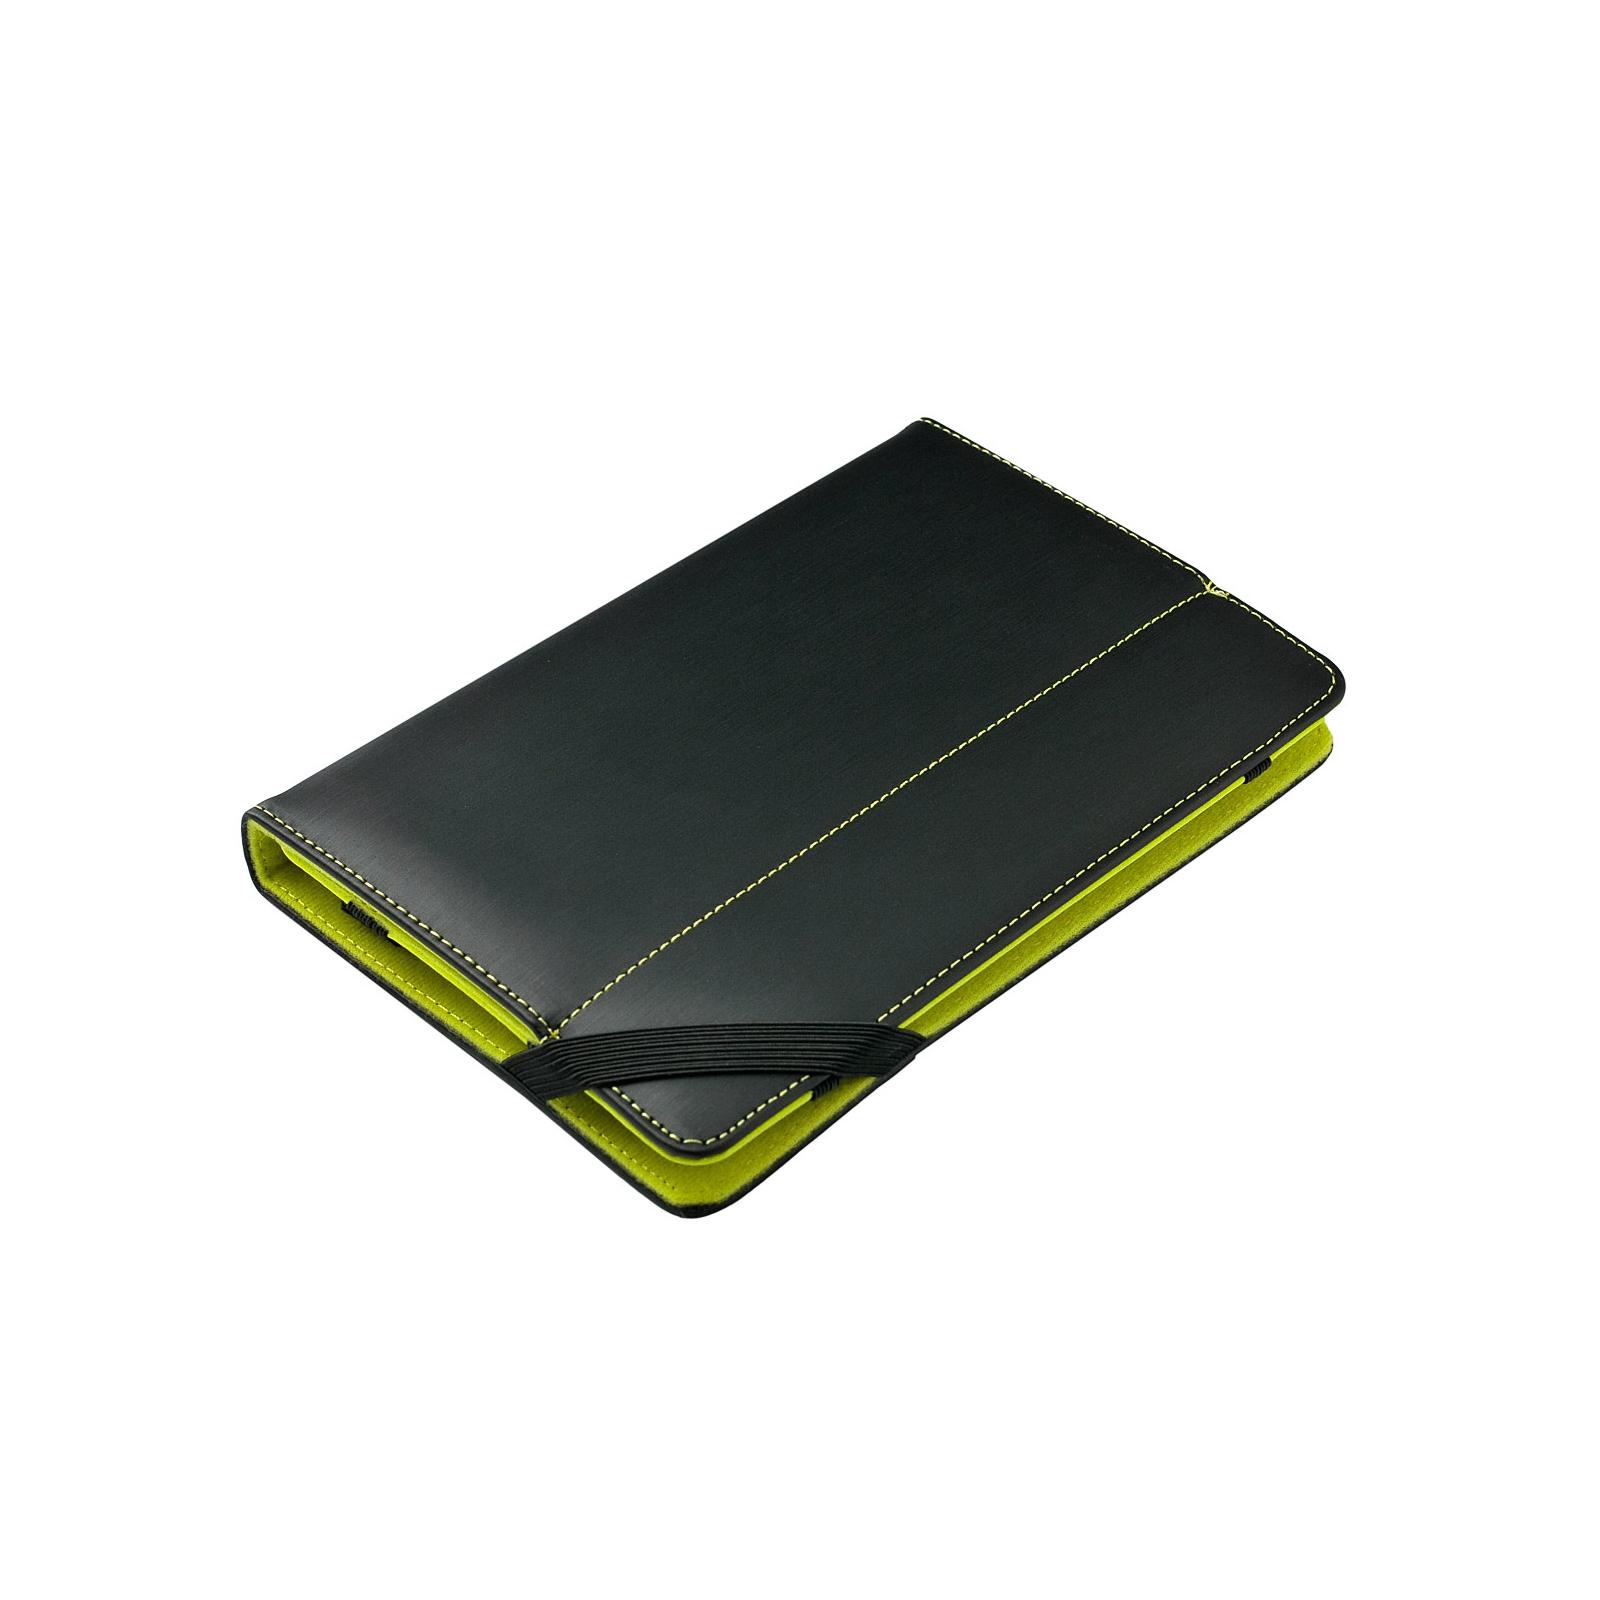 "Чехол для планшета Grand-X universal 7"" Grand-X TC12 Black (UTC - GX7TC12) изображение 4"